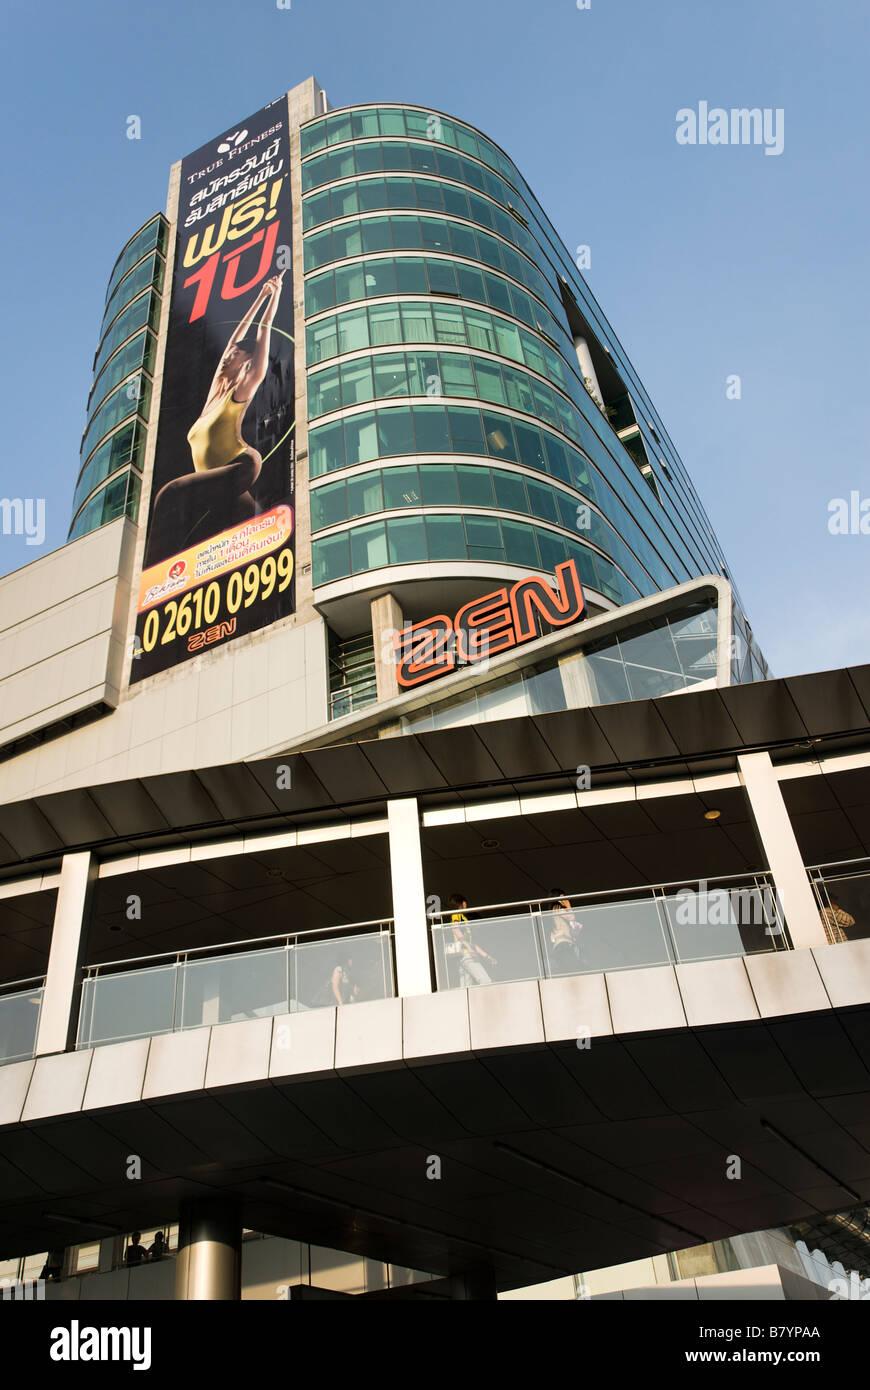 Zen upmarket shopping mall Pathumwan district in central Bangkok Thailand - Stock Image